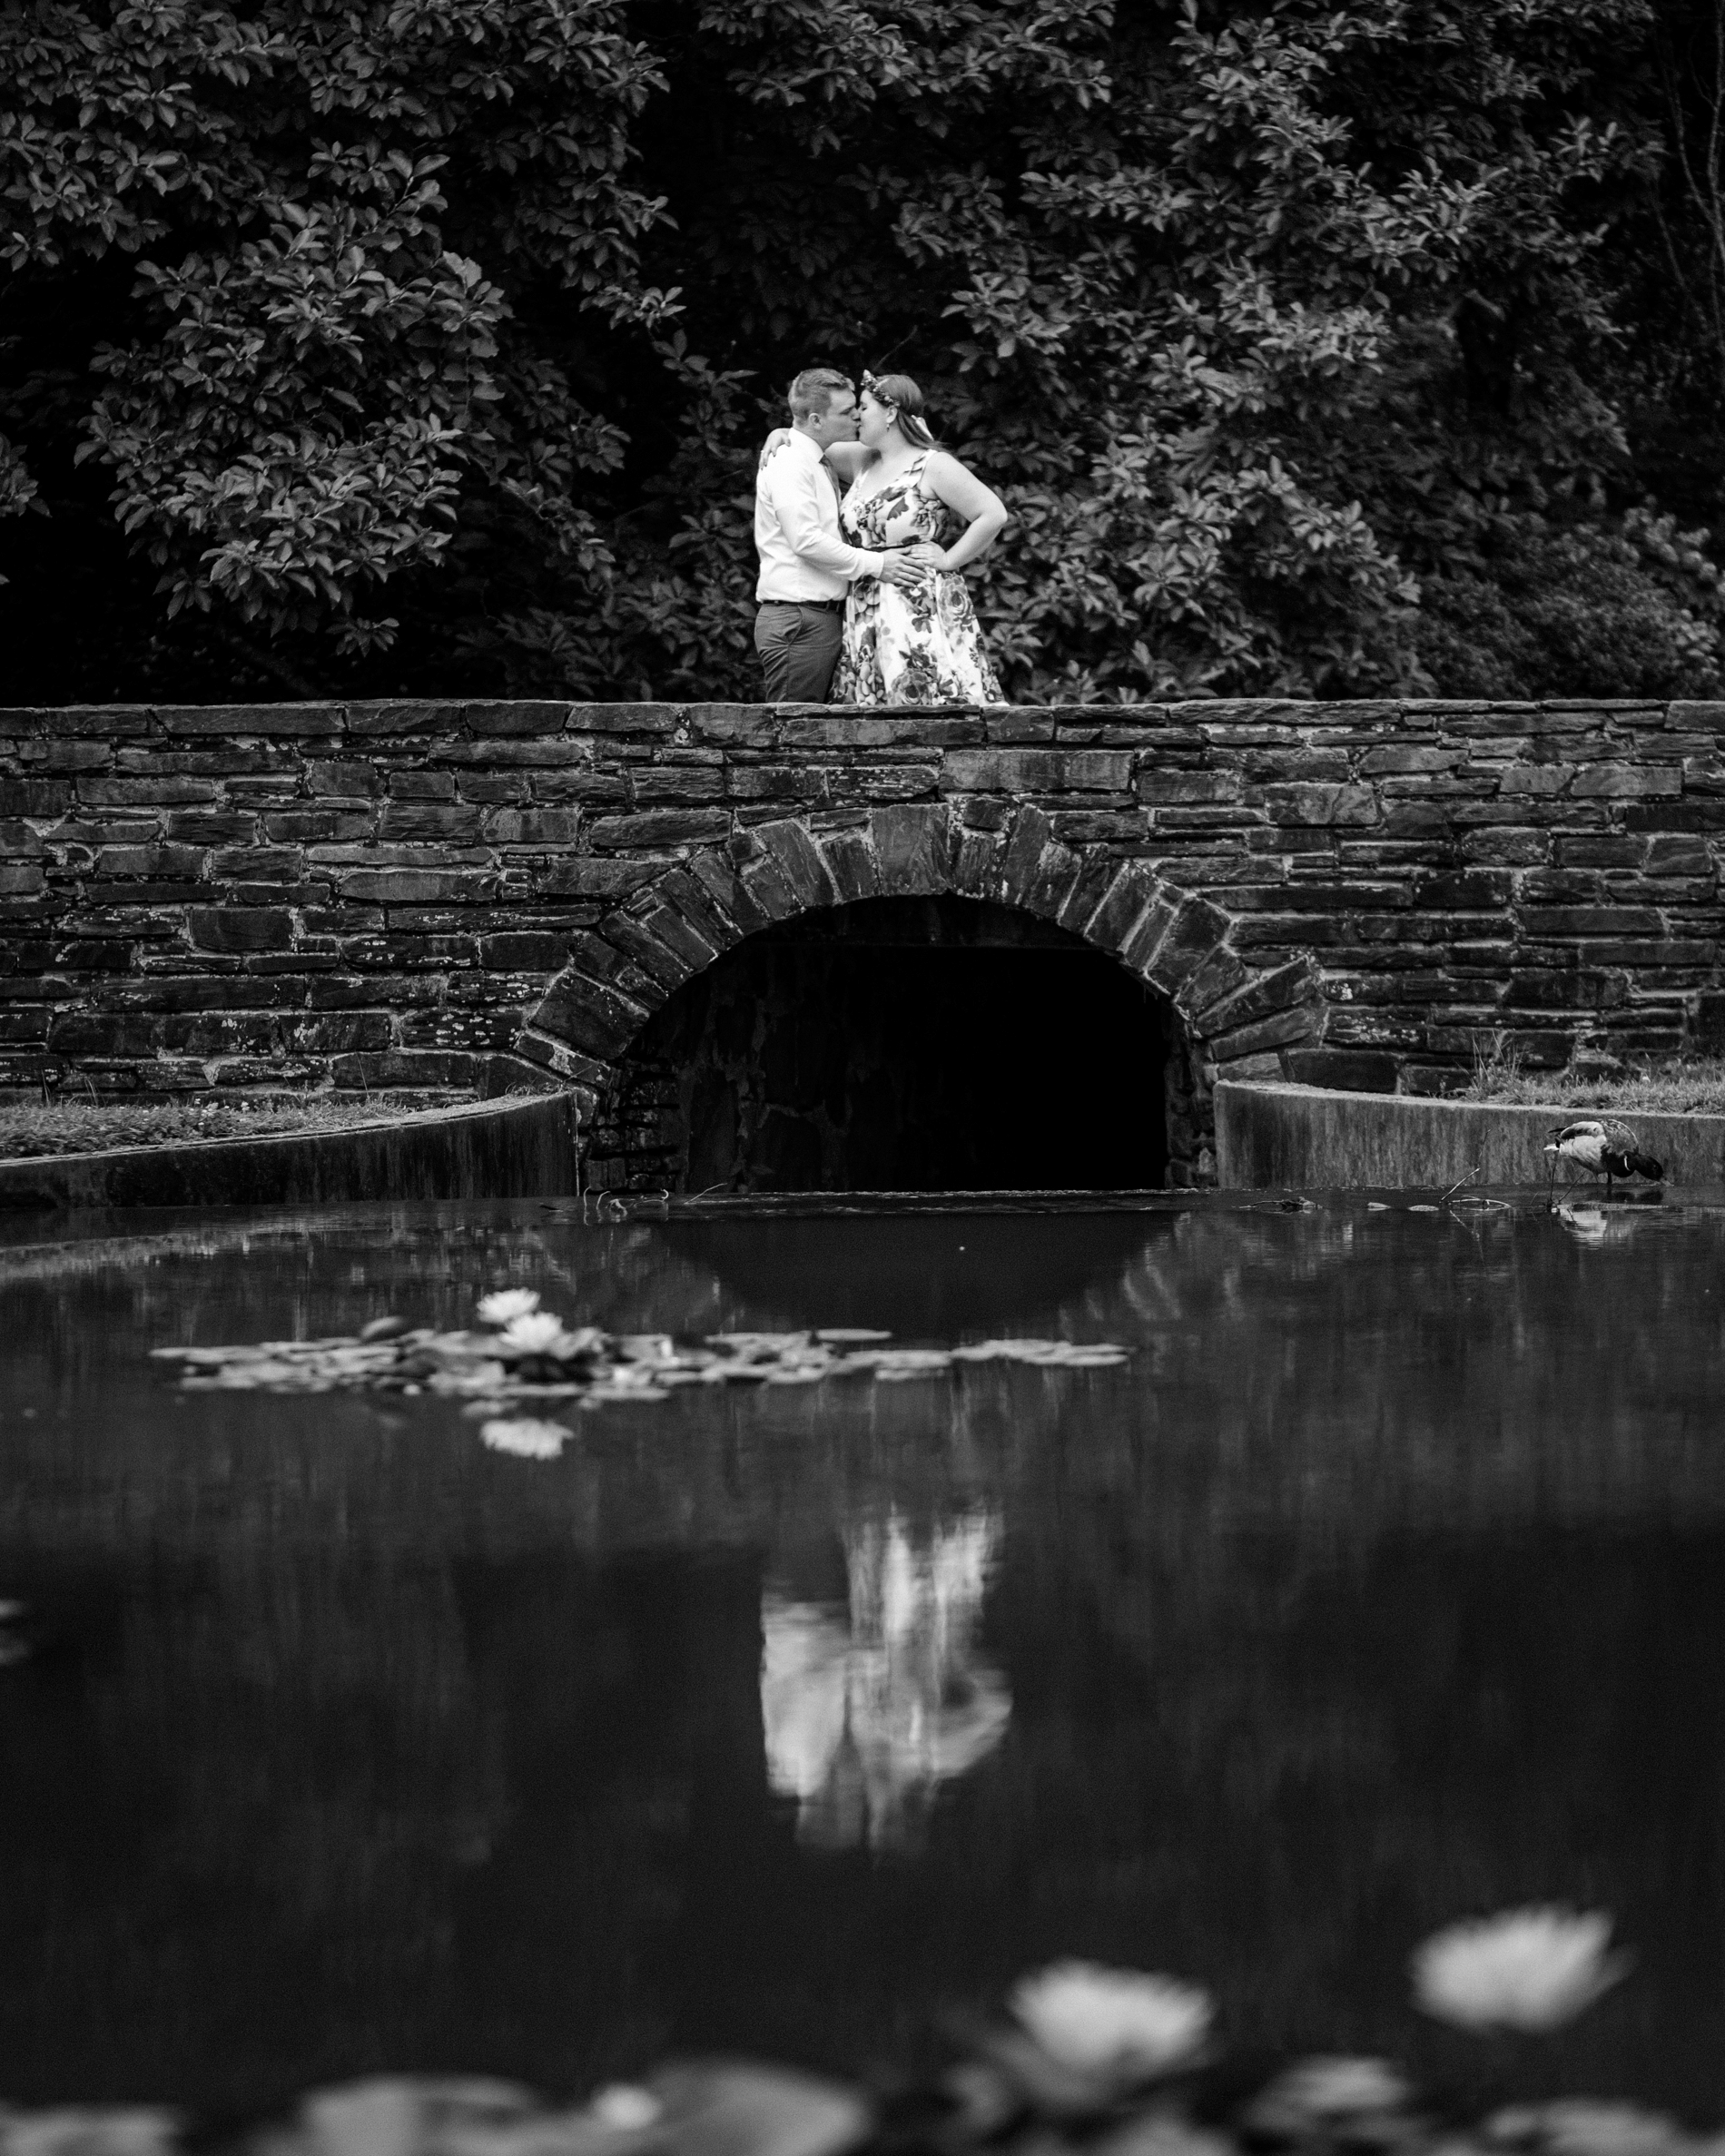 wedding-duke-gardens-zoe-litaker-photography.jpg